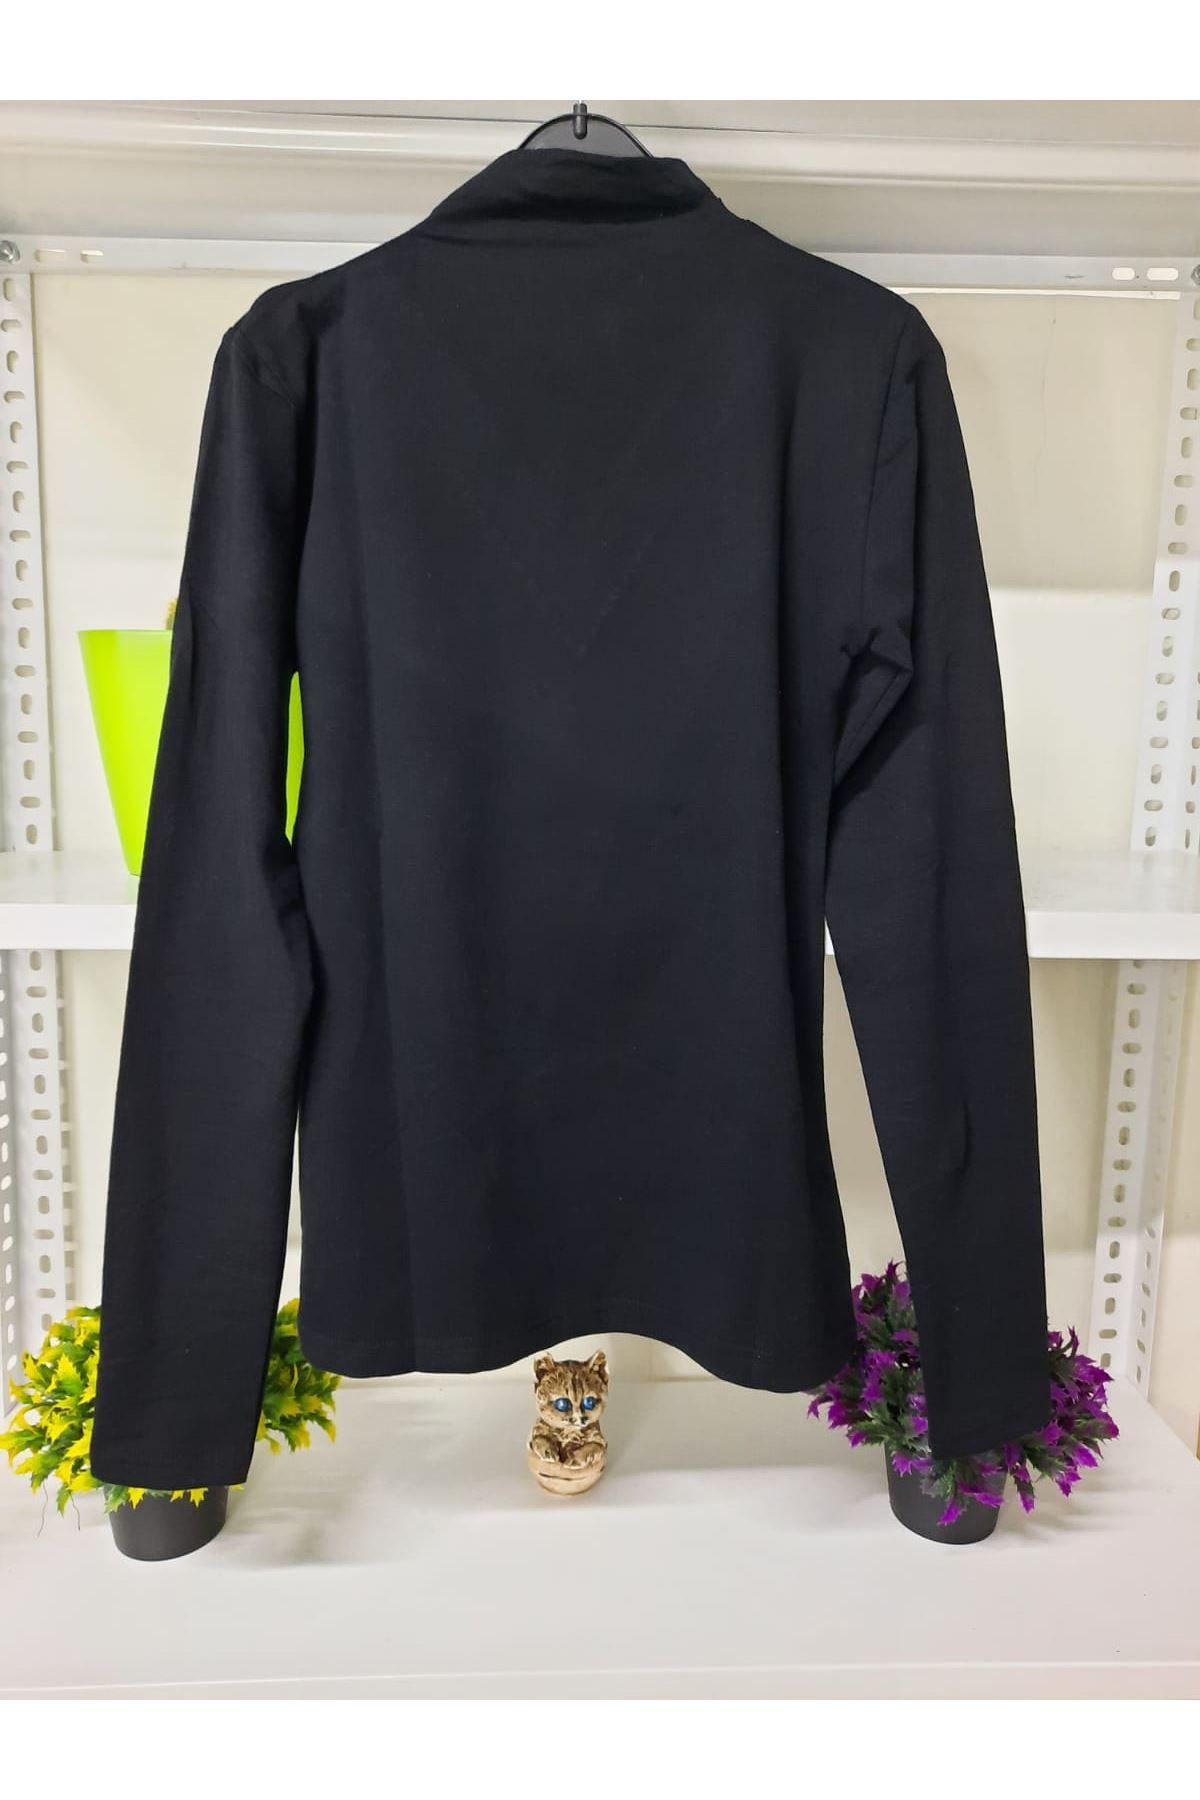 Dantel ve Taş Detaylı Bluz - siyah